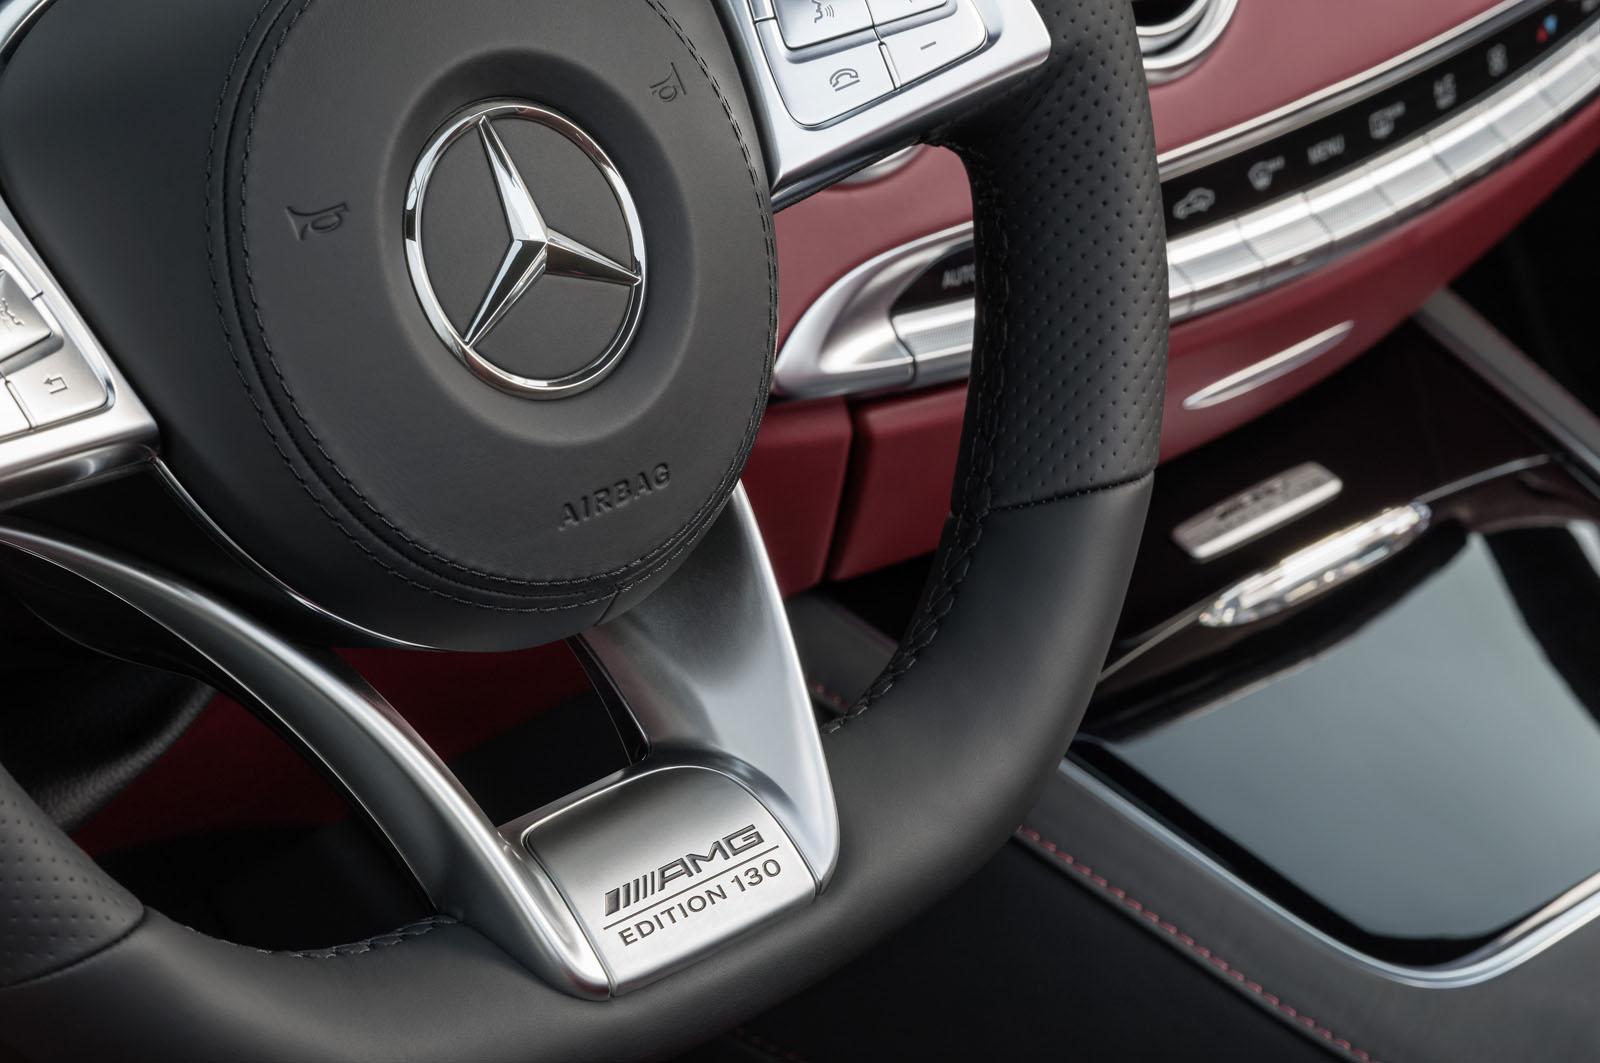 Mercedes  Se Cabrio